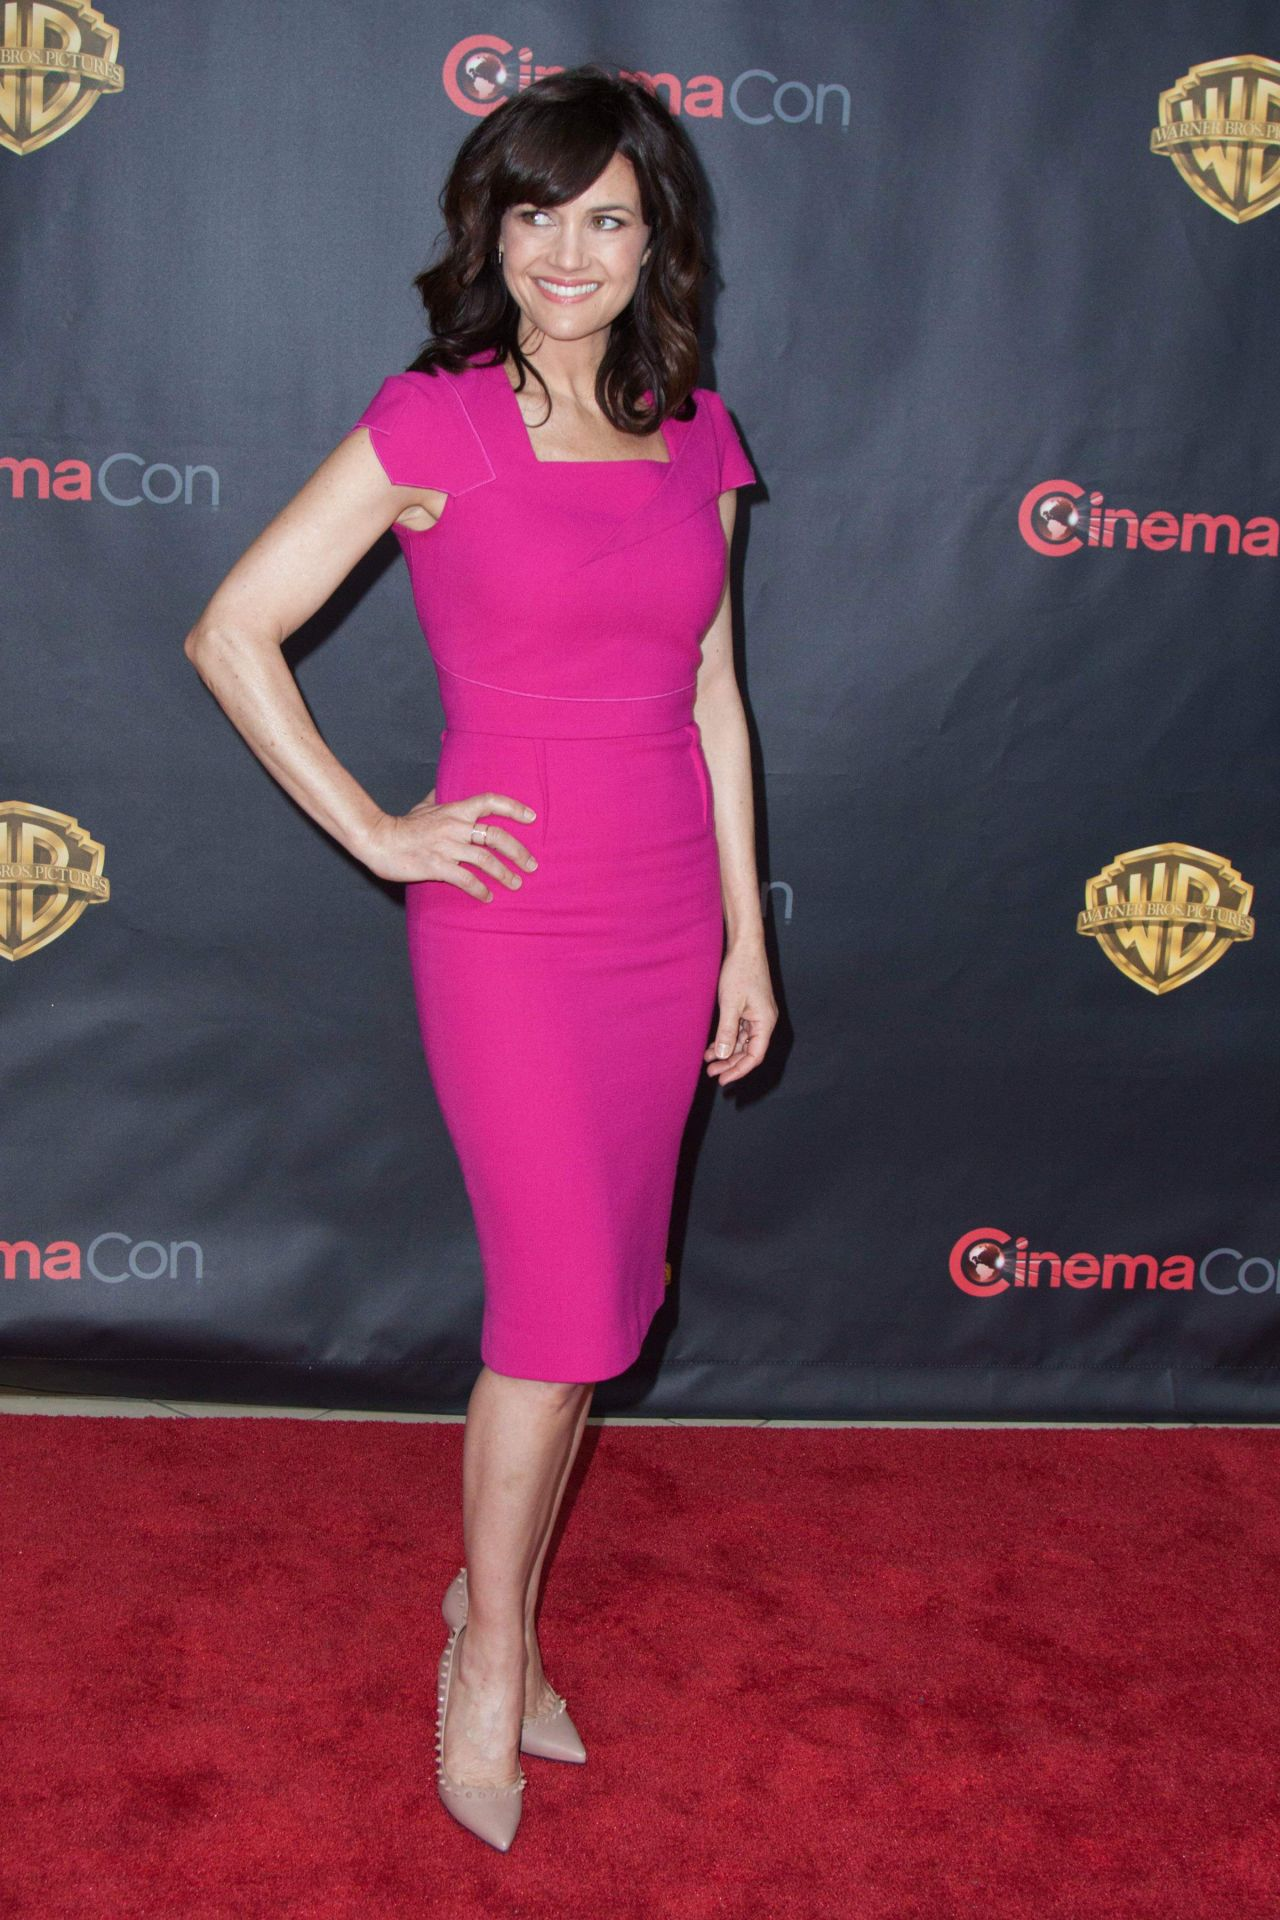 Carla Gugino 2015 Cinemacon Warner Bros Presents The